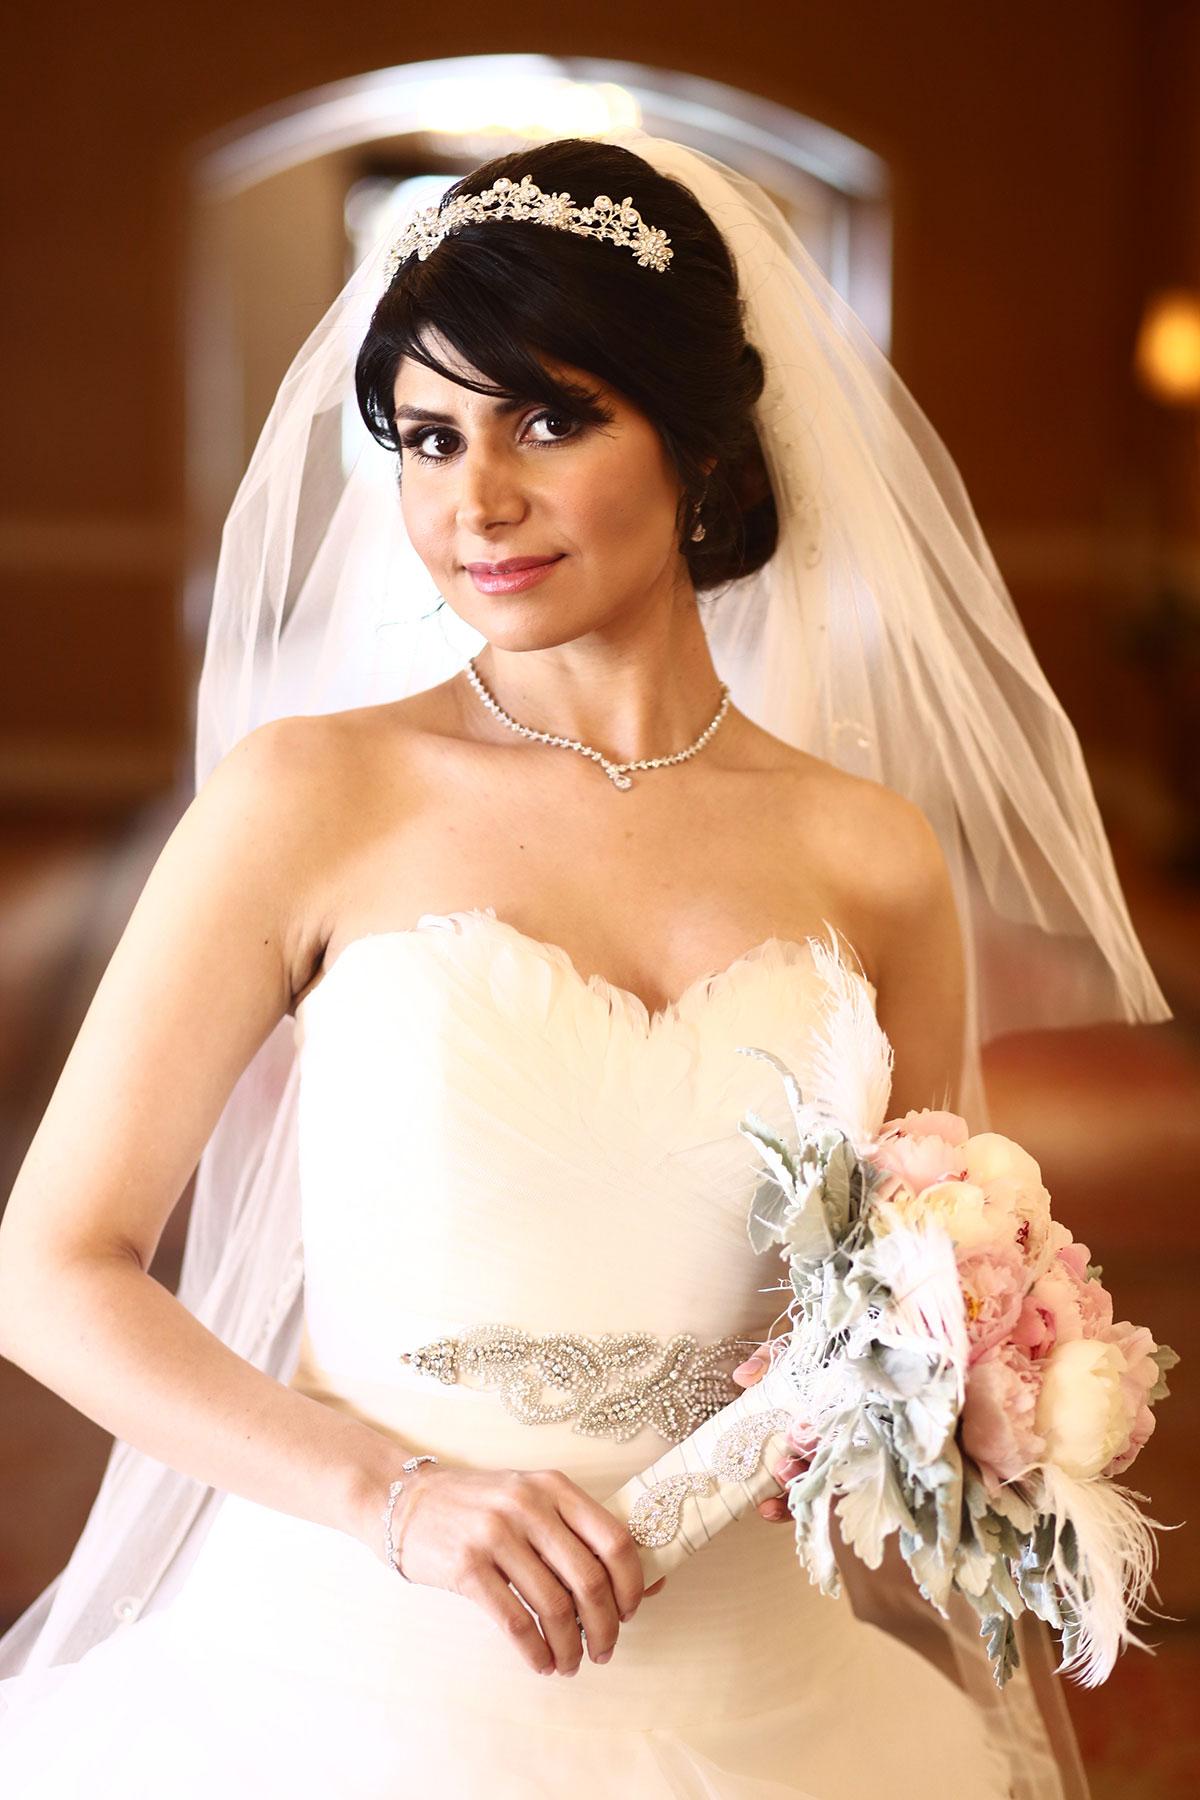 Wedding_Chicago_Iman_Sharareh_005.jpg